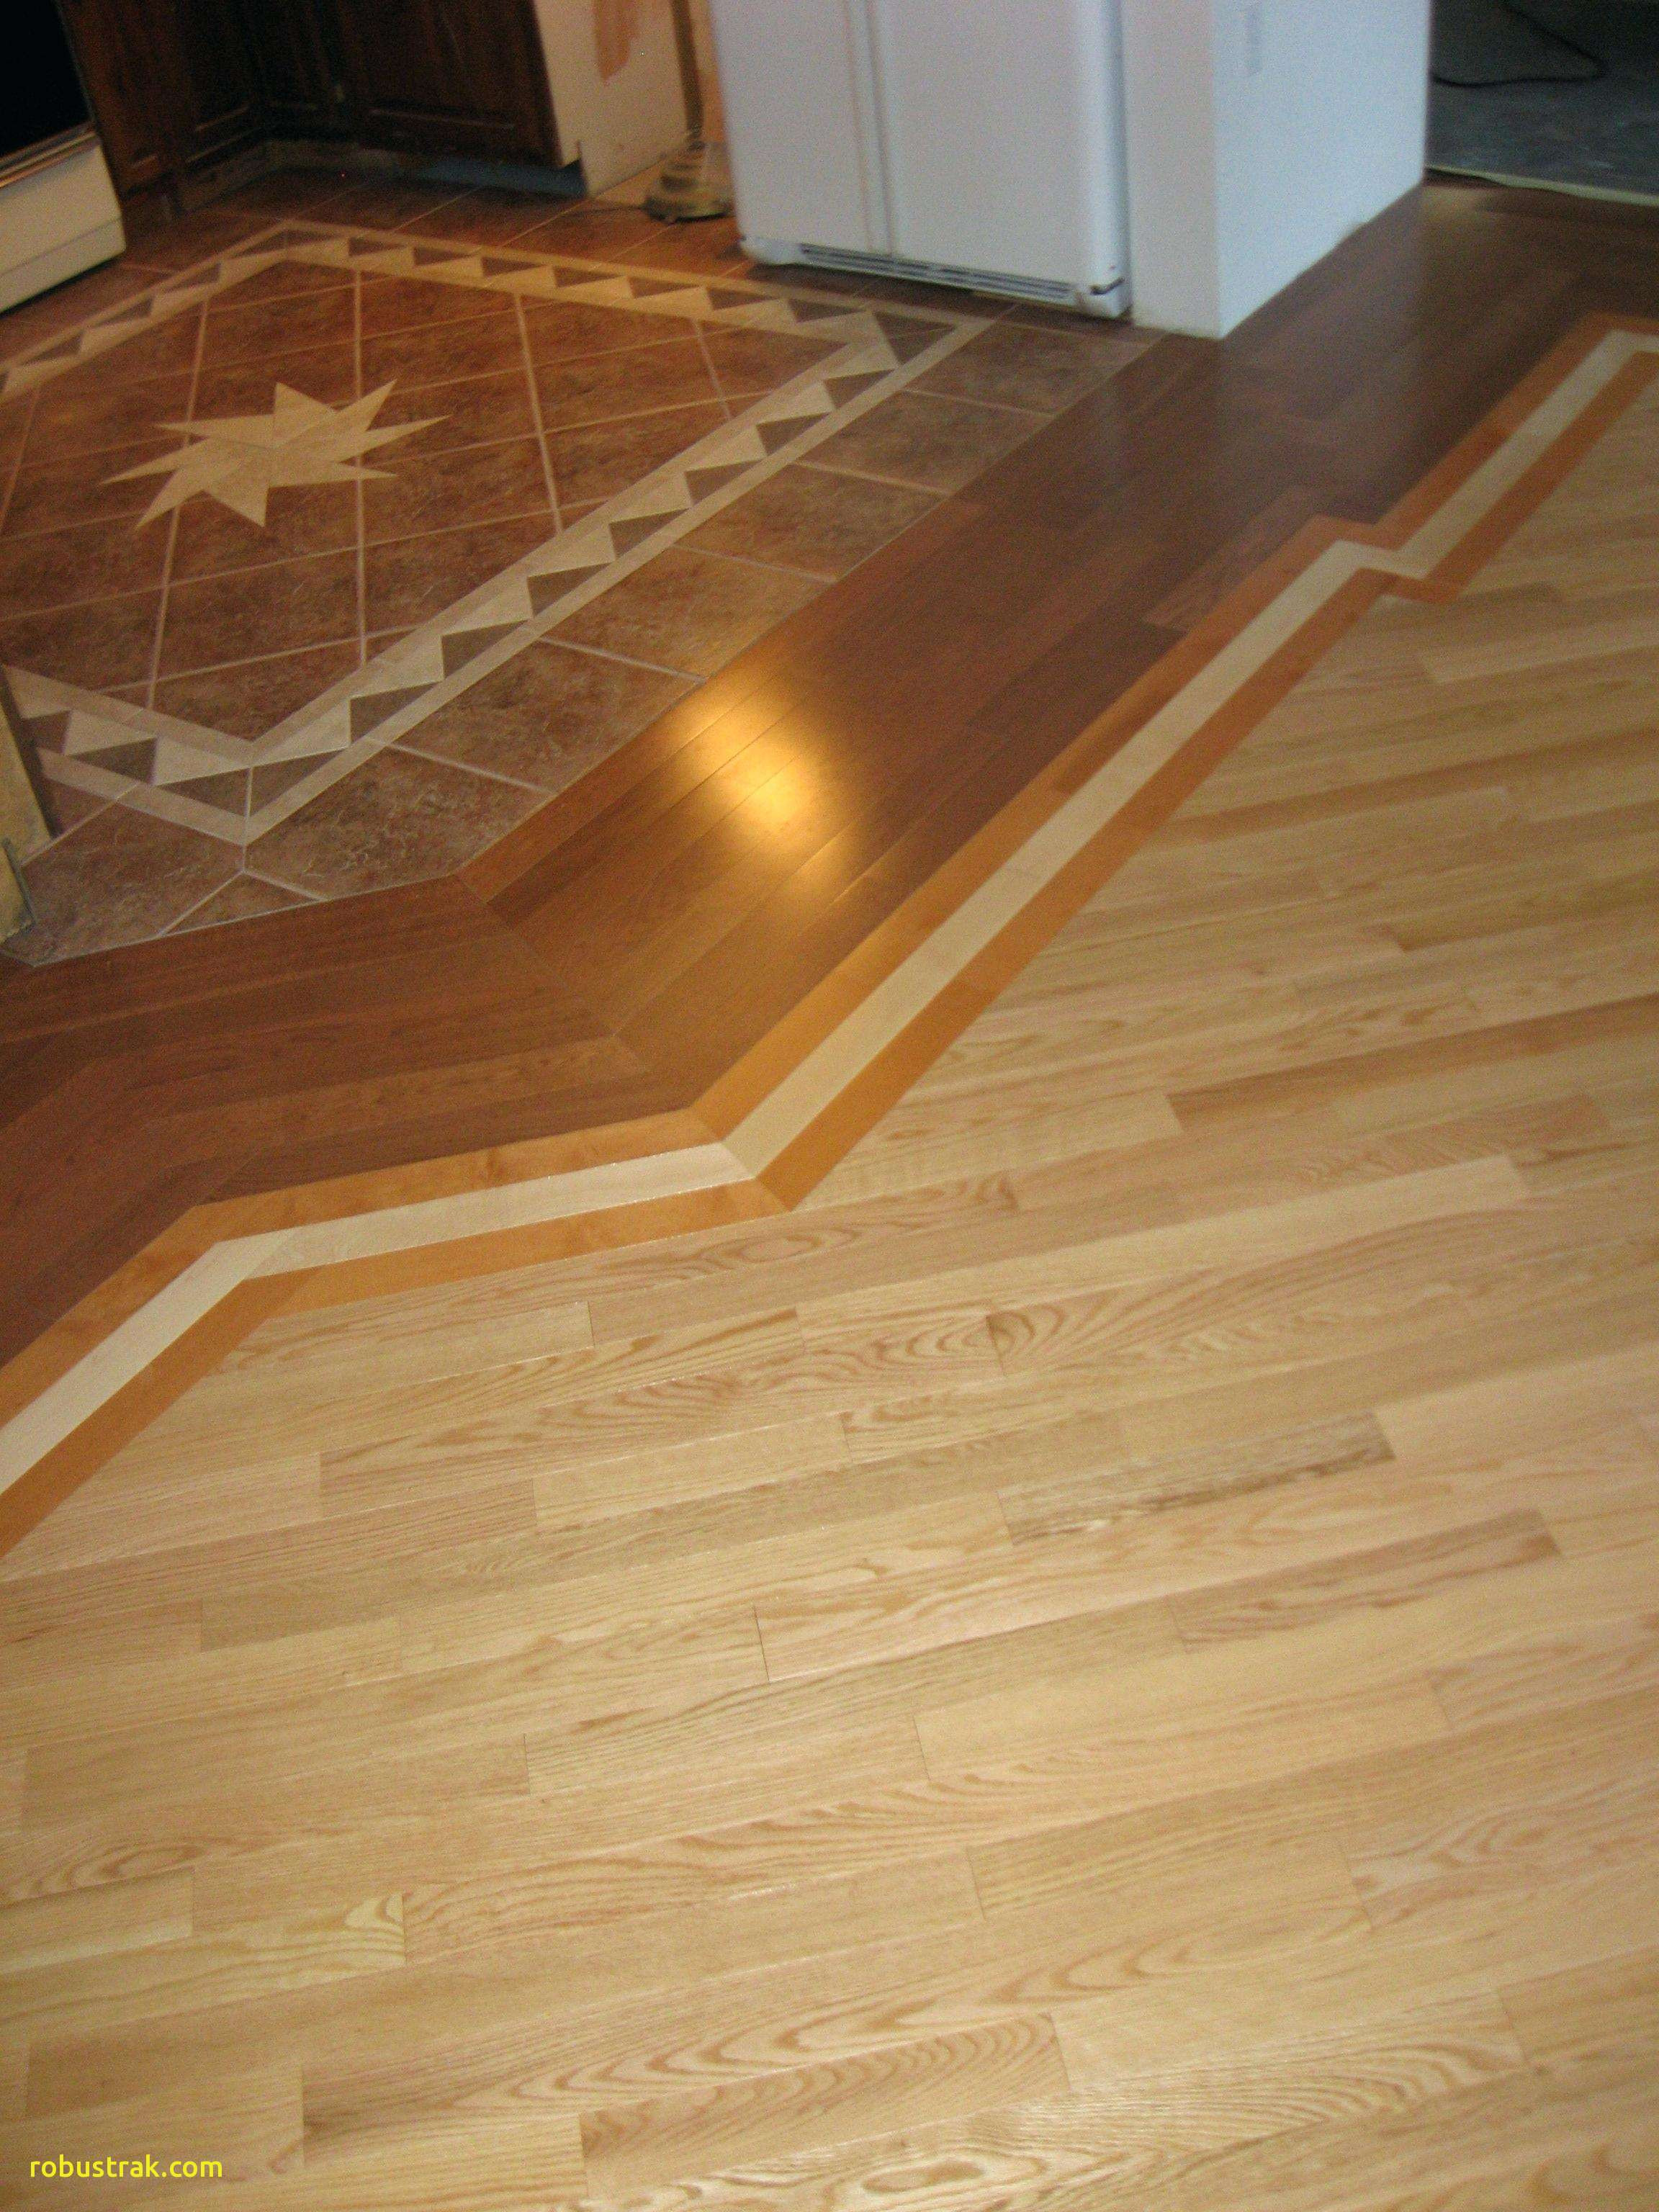 hardwood floor and carpet transition of wood to tile transition strips fresh flooring wooden floor tiles with wood to tile transition strips fresh flooring wooden floor tiles priceod in india flooring tile